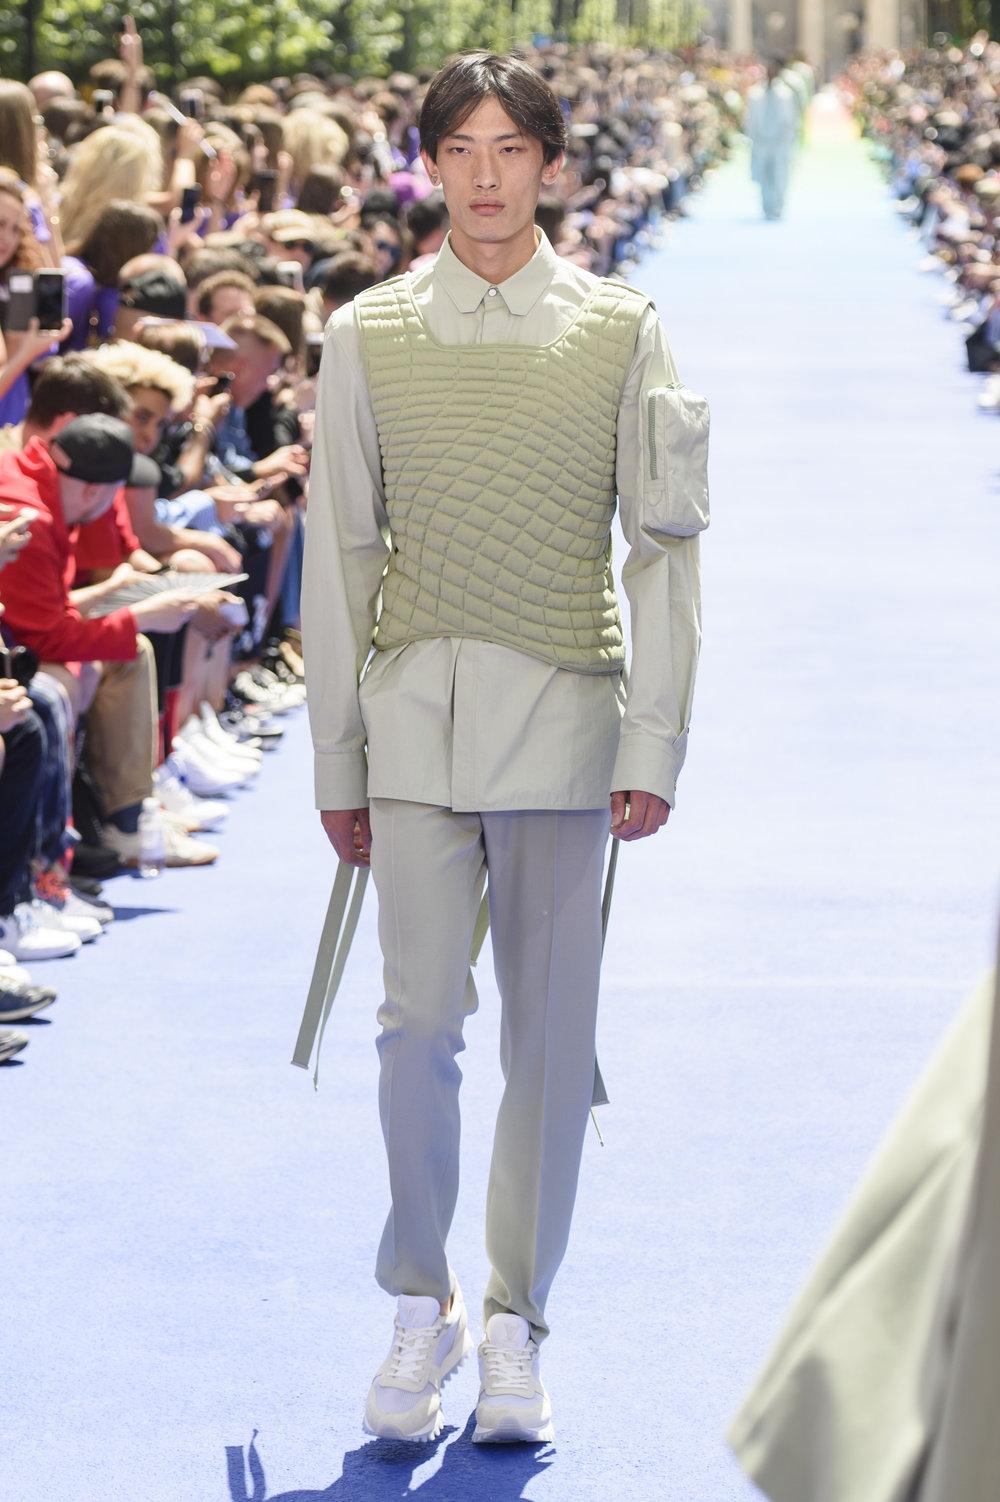 22_Louis_Vuitton_original_vui_prs_ss19_067.jpg